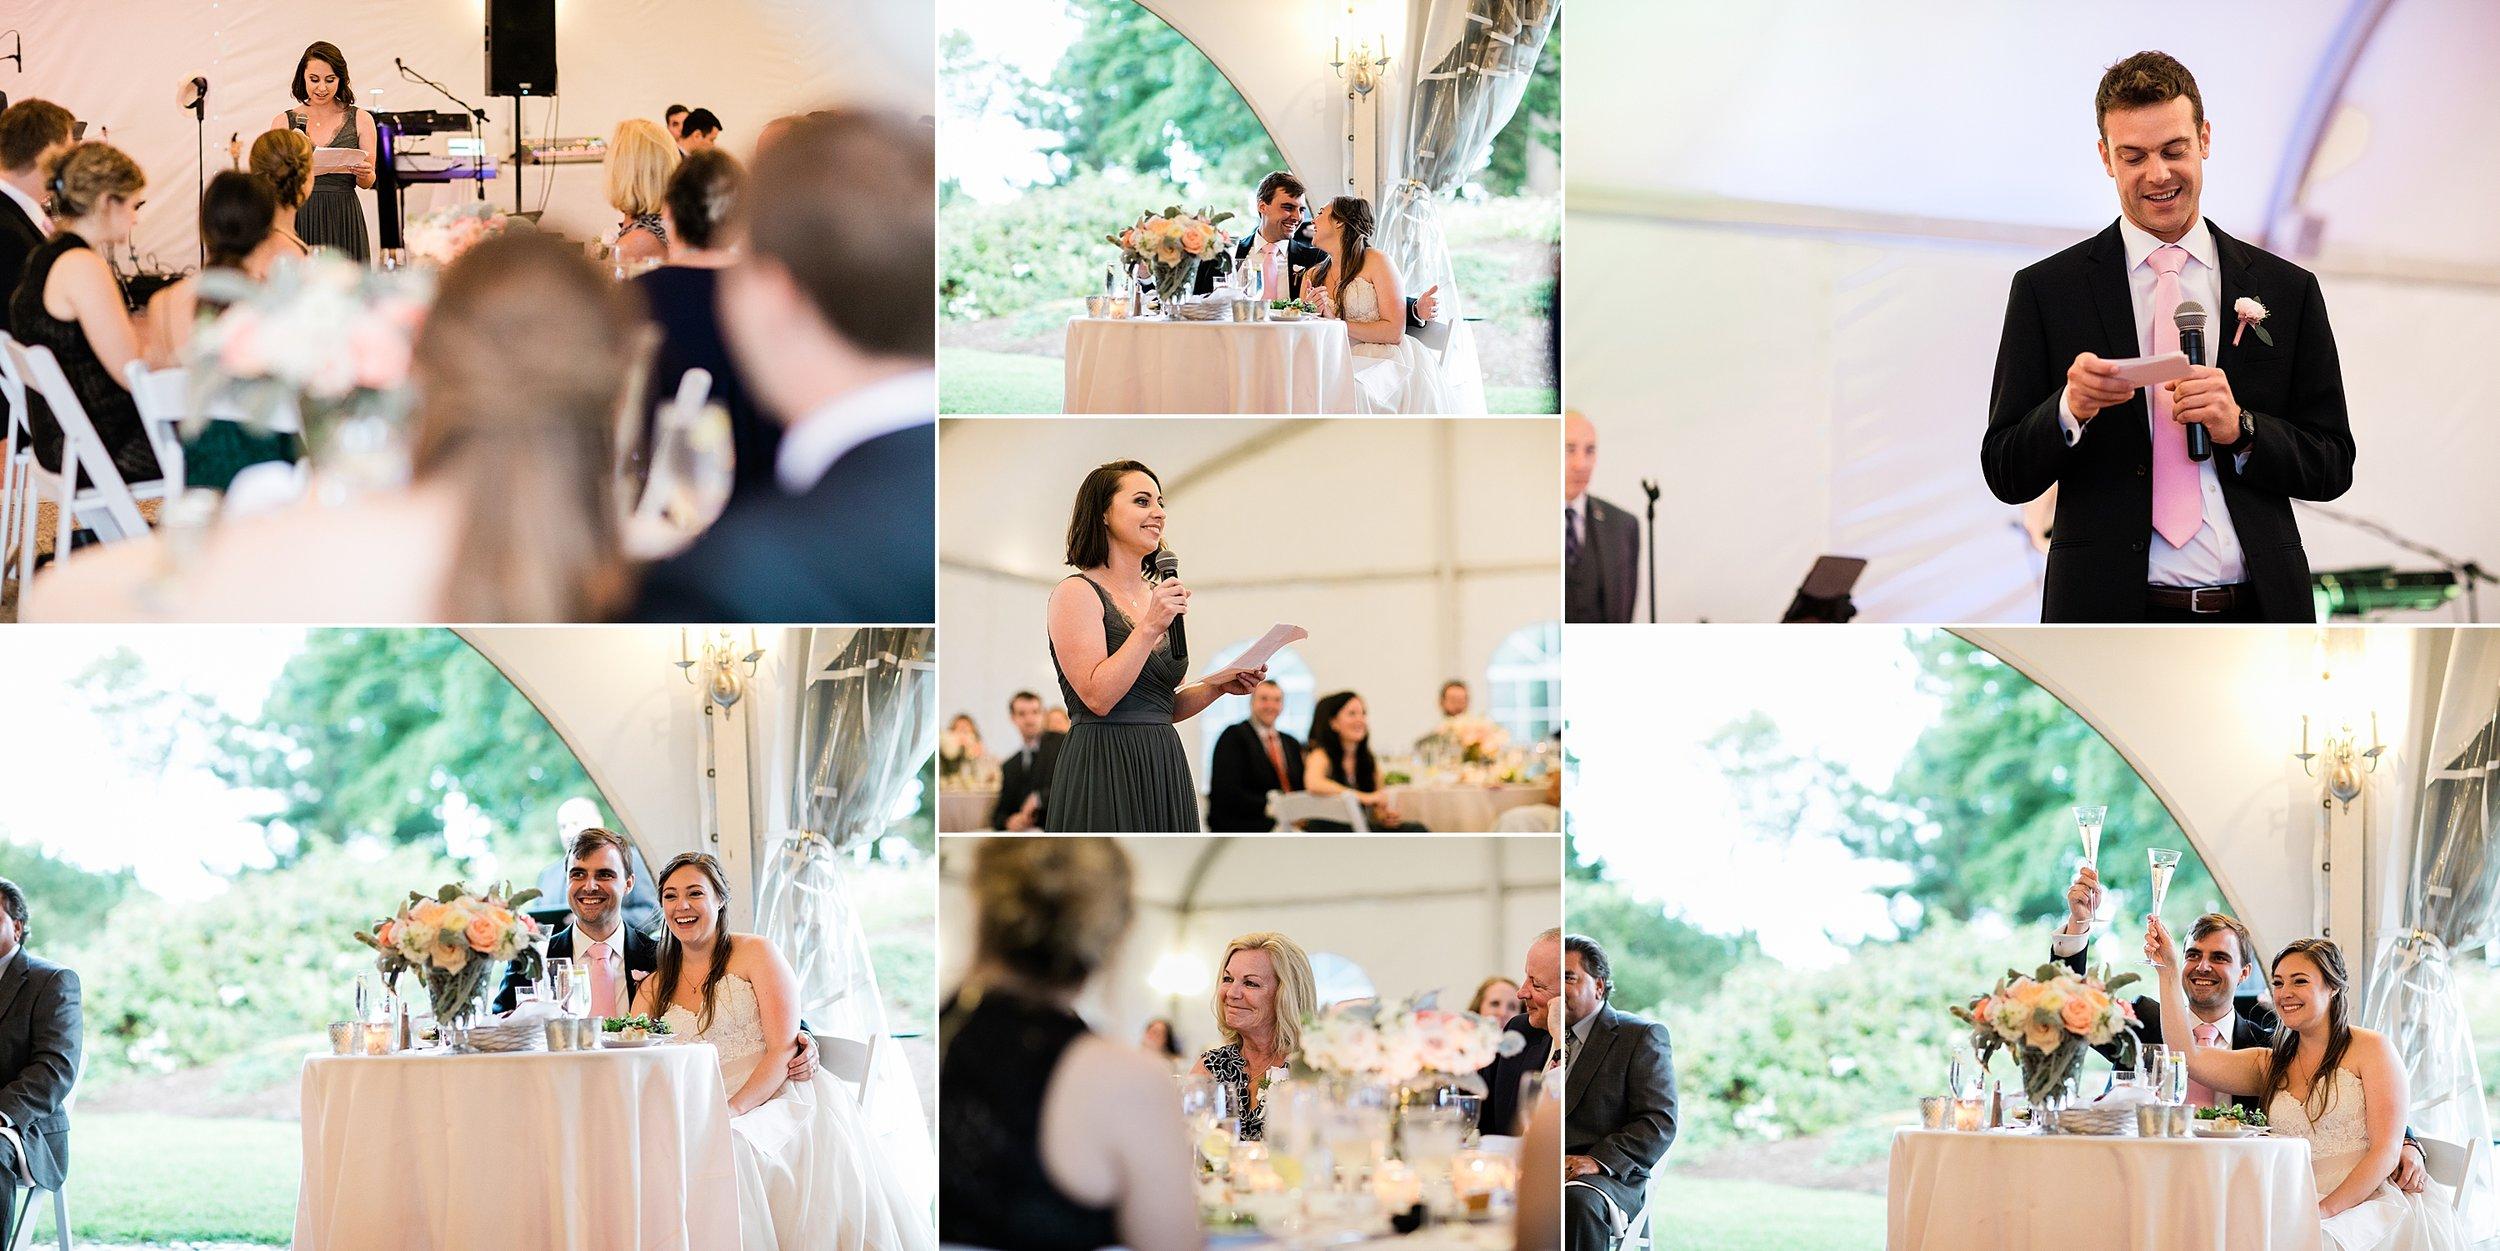 043 los angeles wedding photographer todd danforth photography boston.jpg